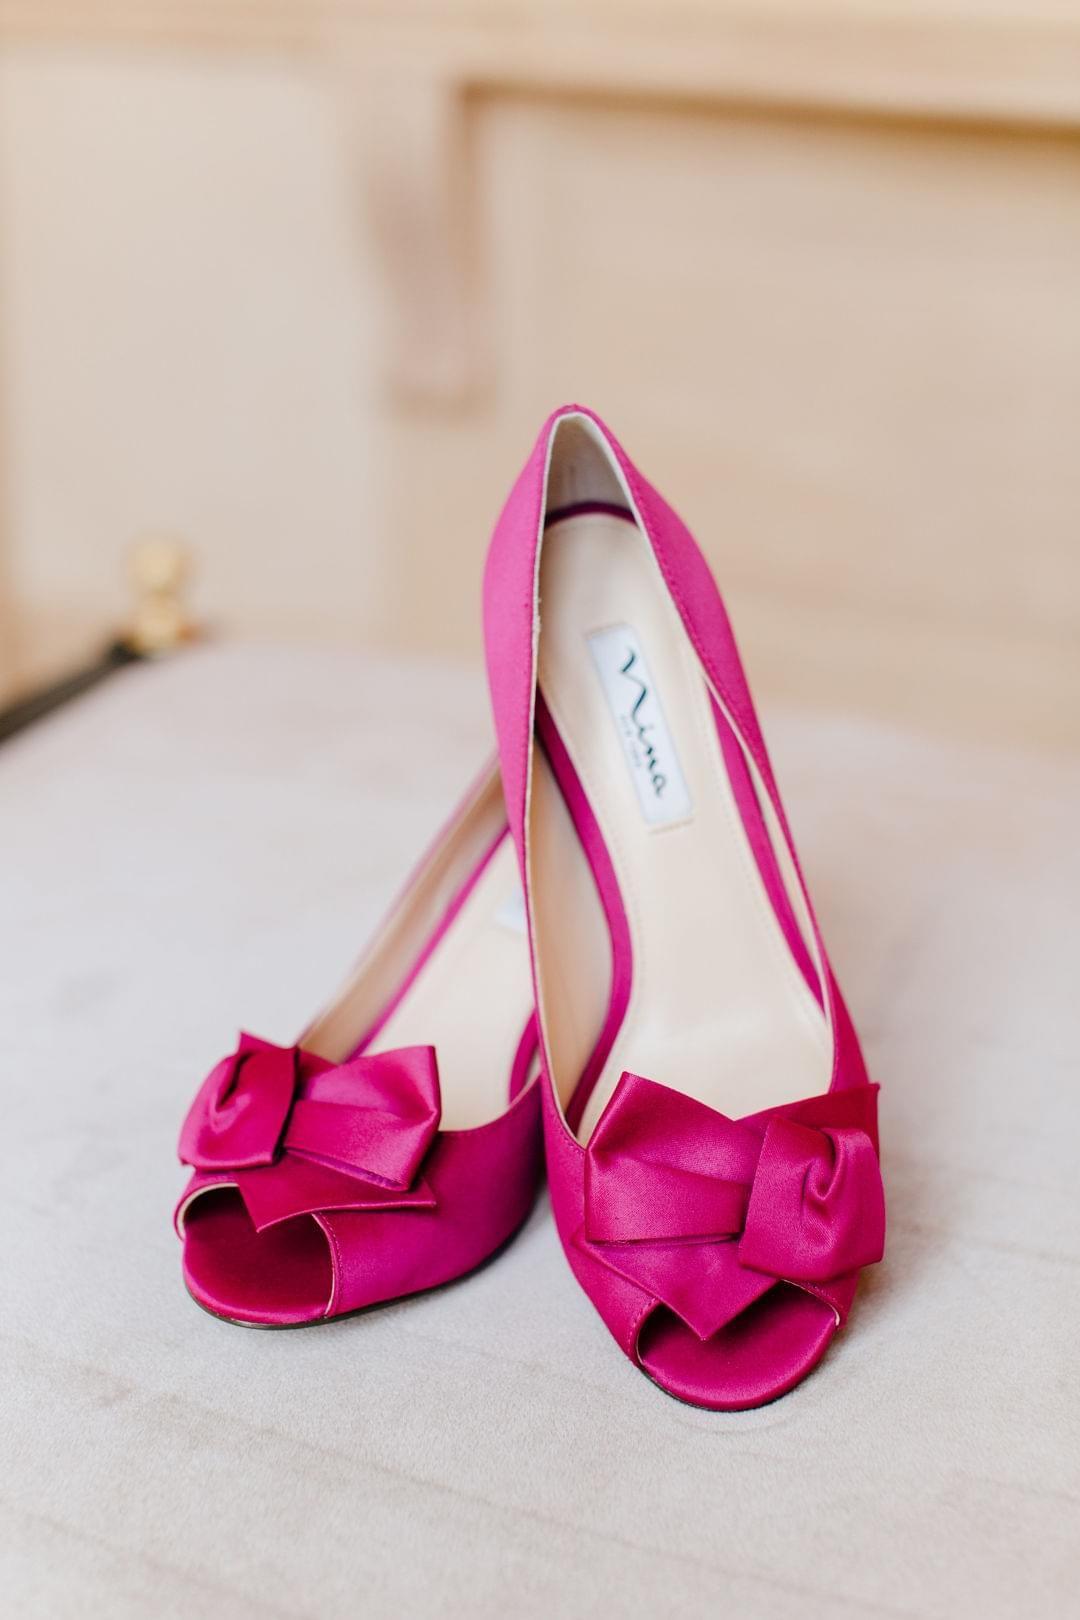 0d6eb51a3702 Hot pink satin